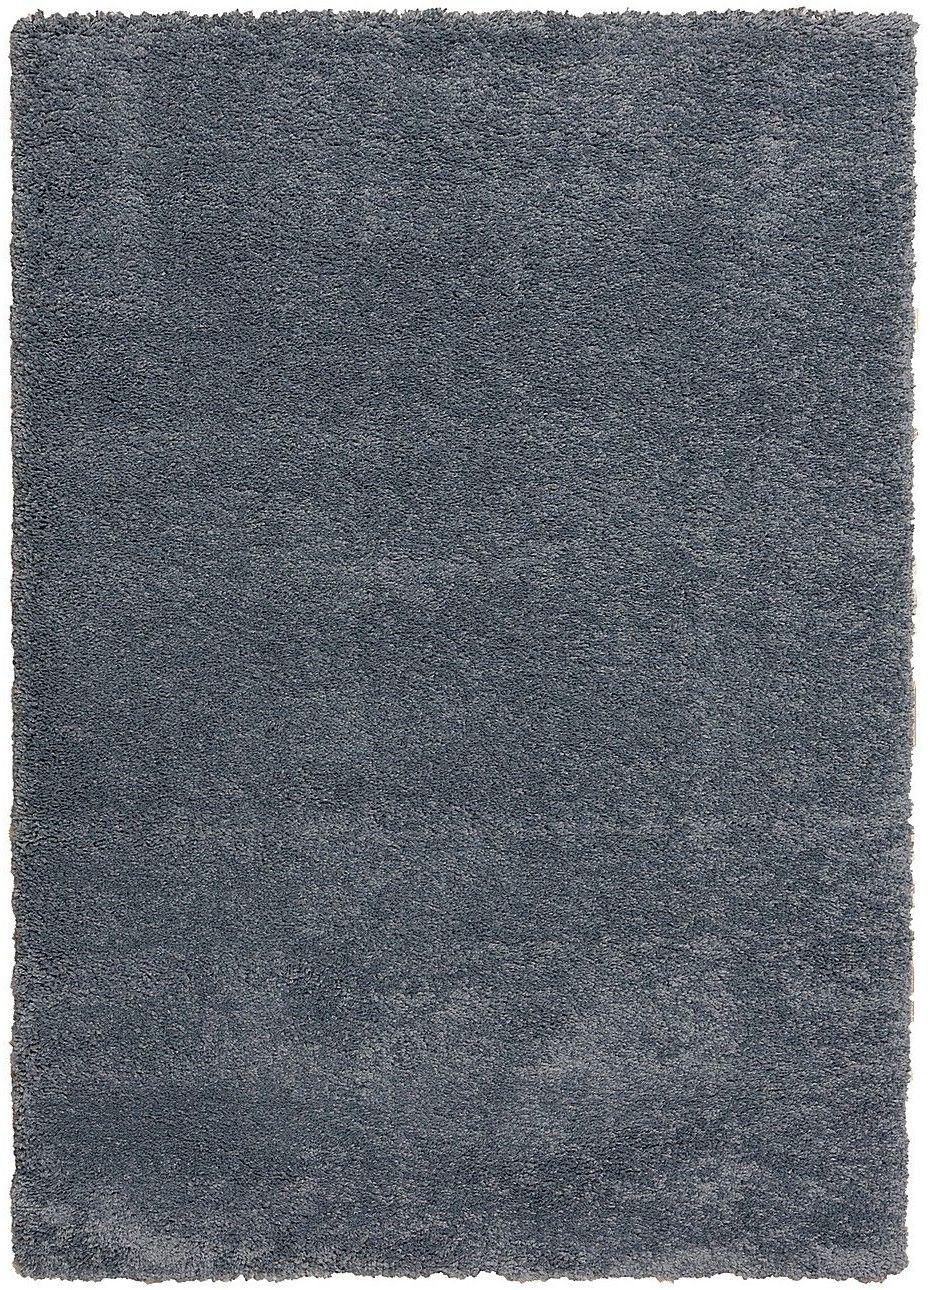 Dywan Royal smoky blue 120x170cm